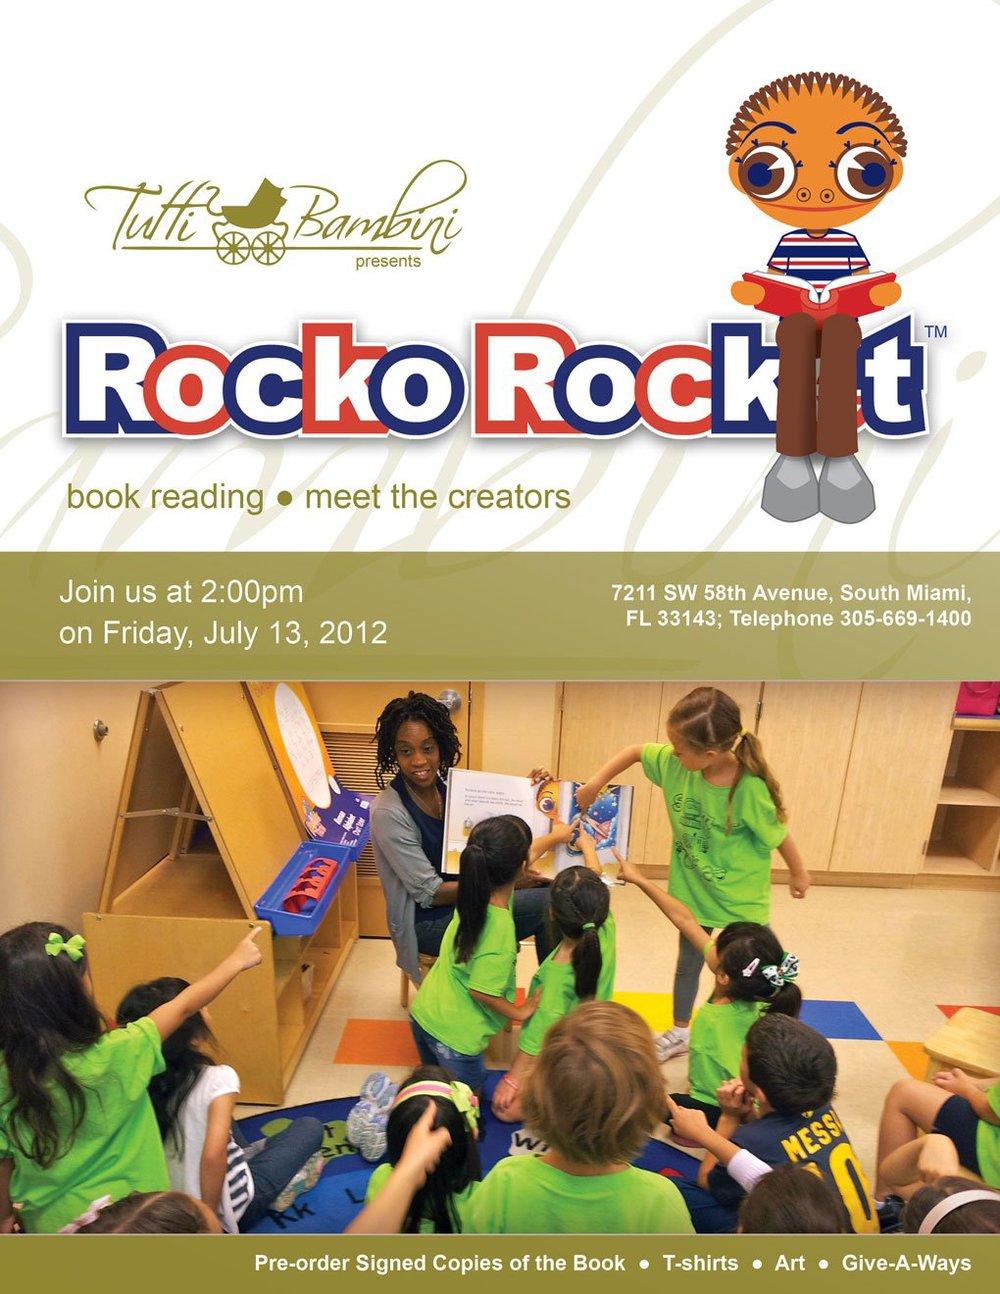 rodney_jackson_rocko_rocket_childrens_book_science_faith.jpg